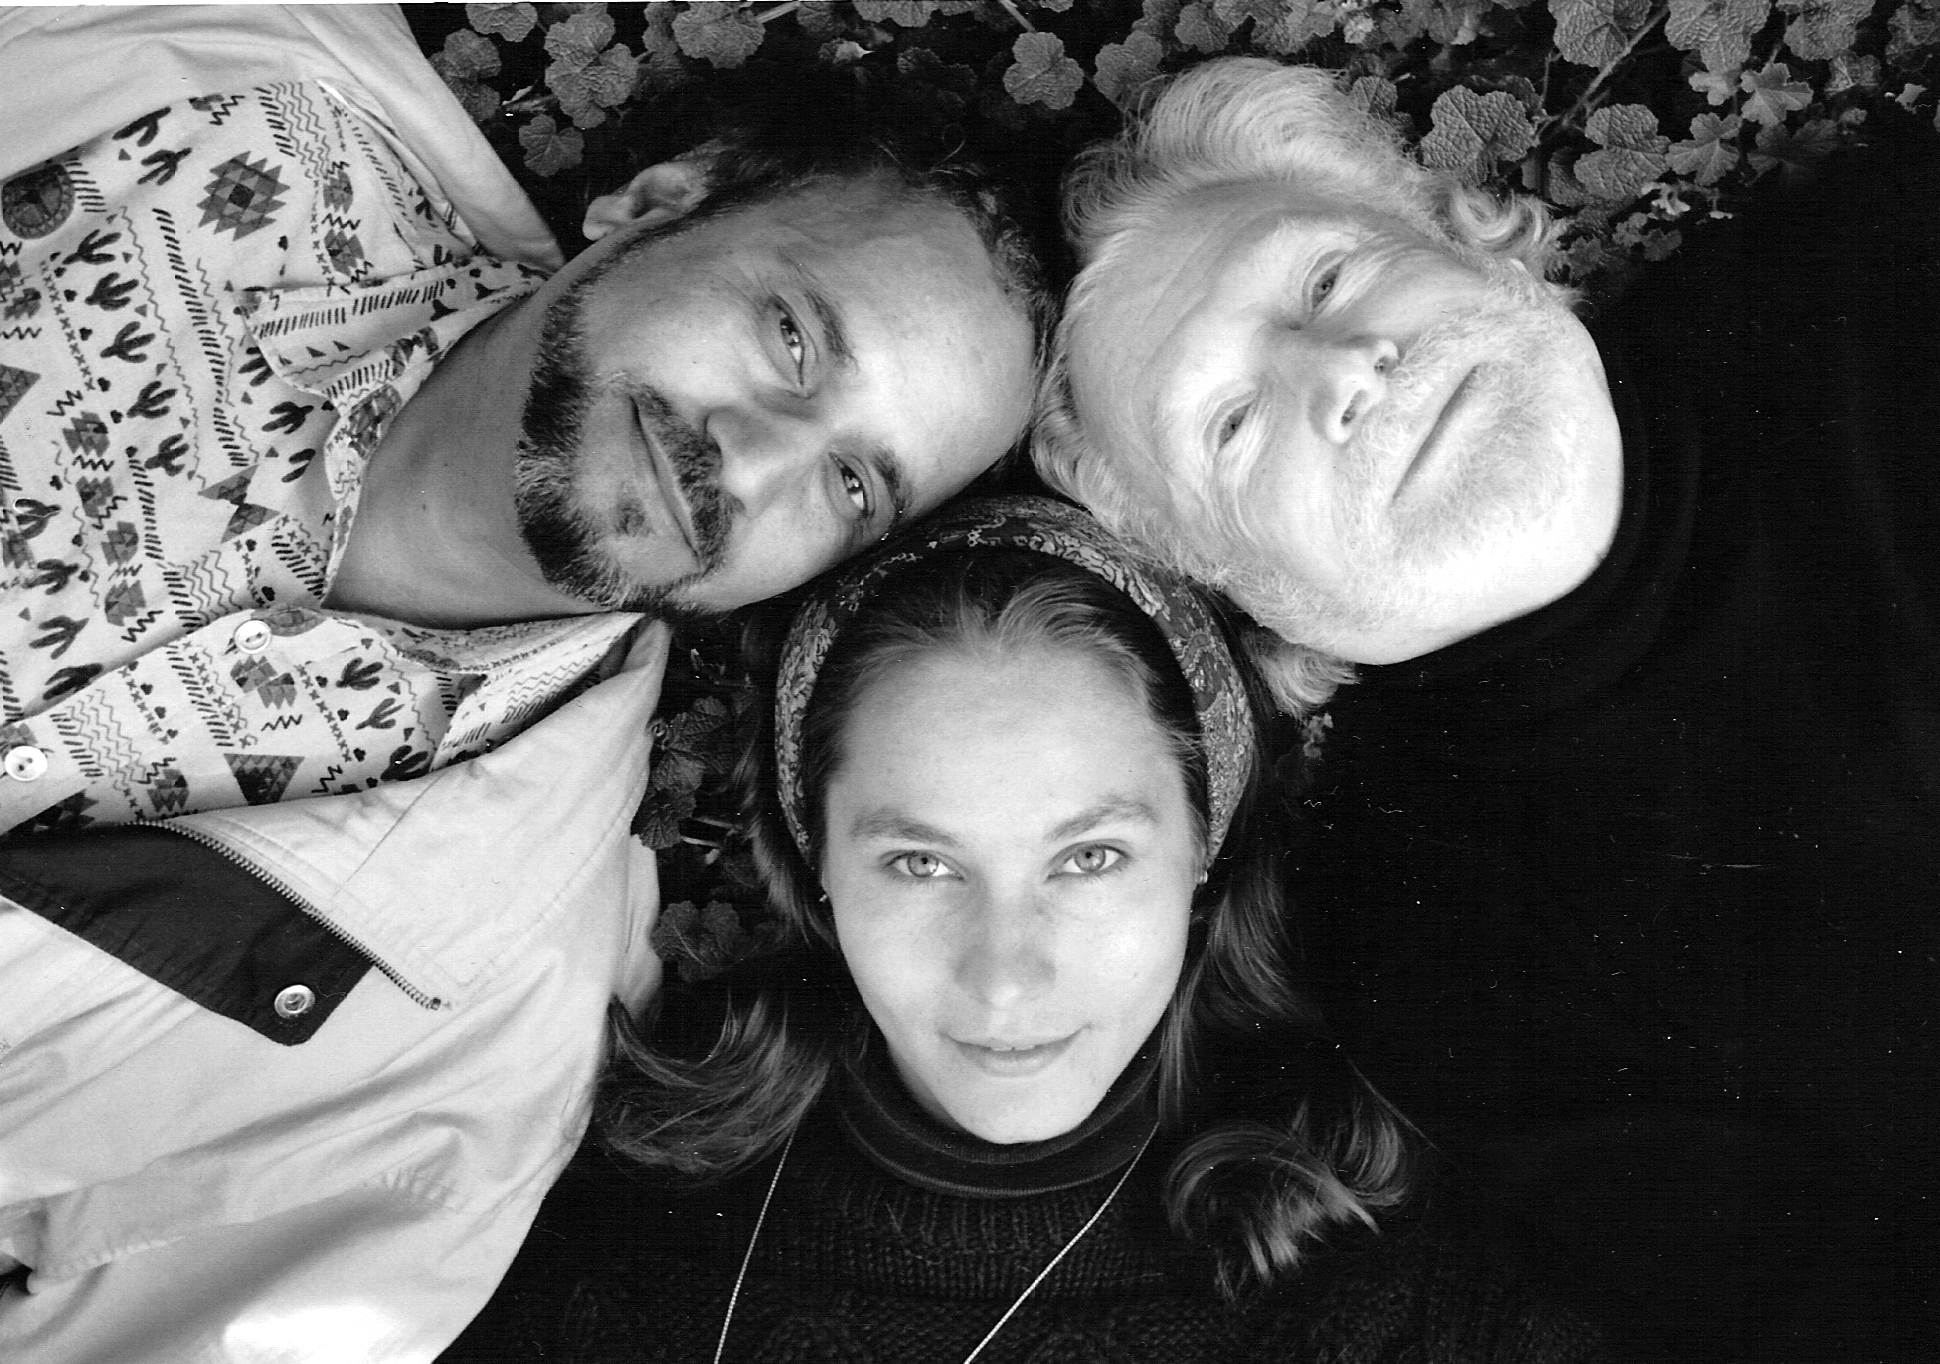 Ajmer Rode, Lori-ann, Michael Bullock